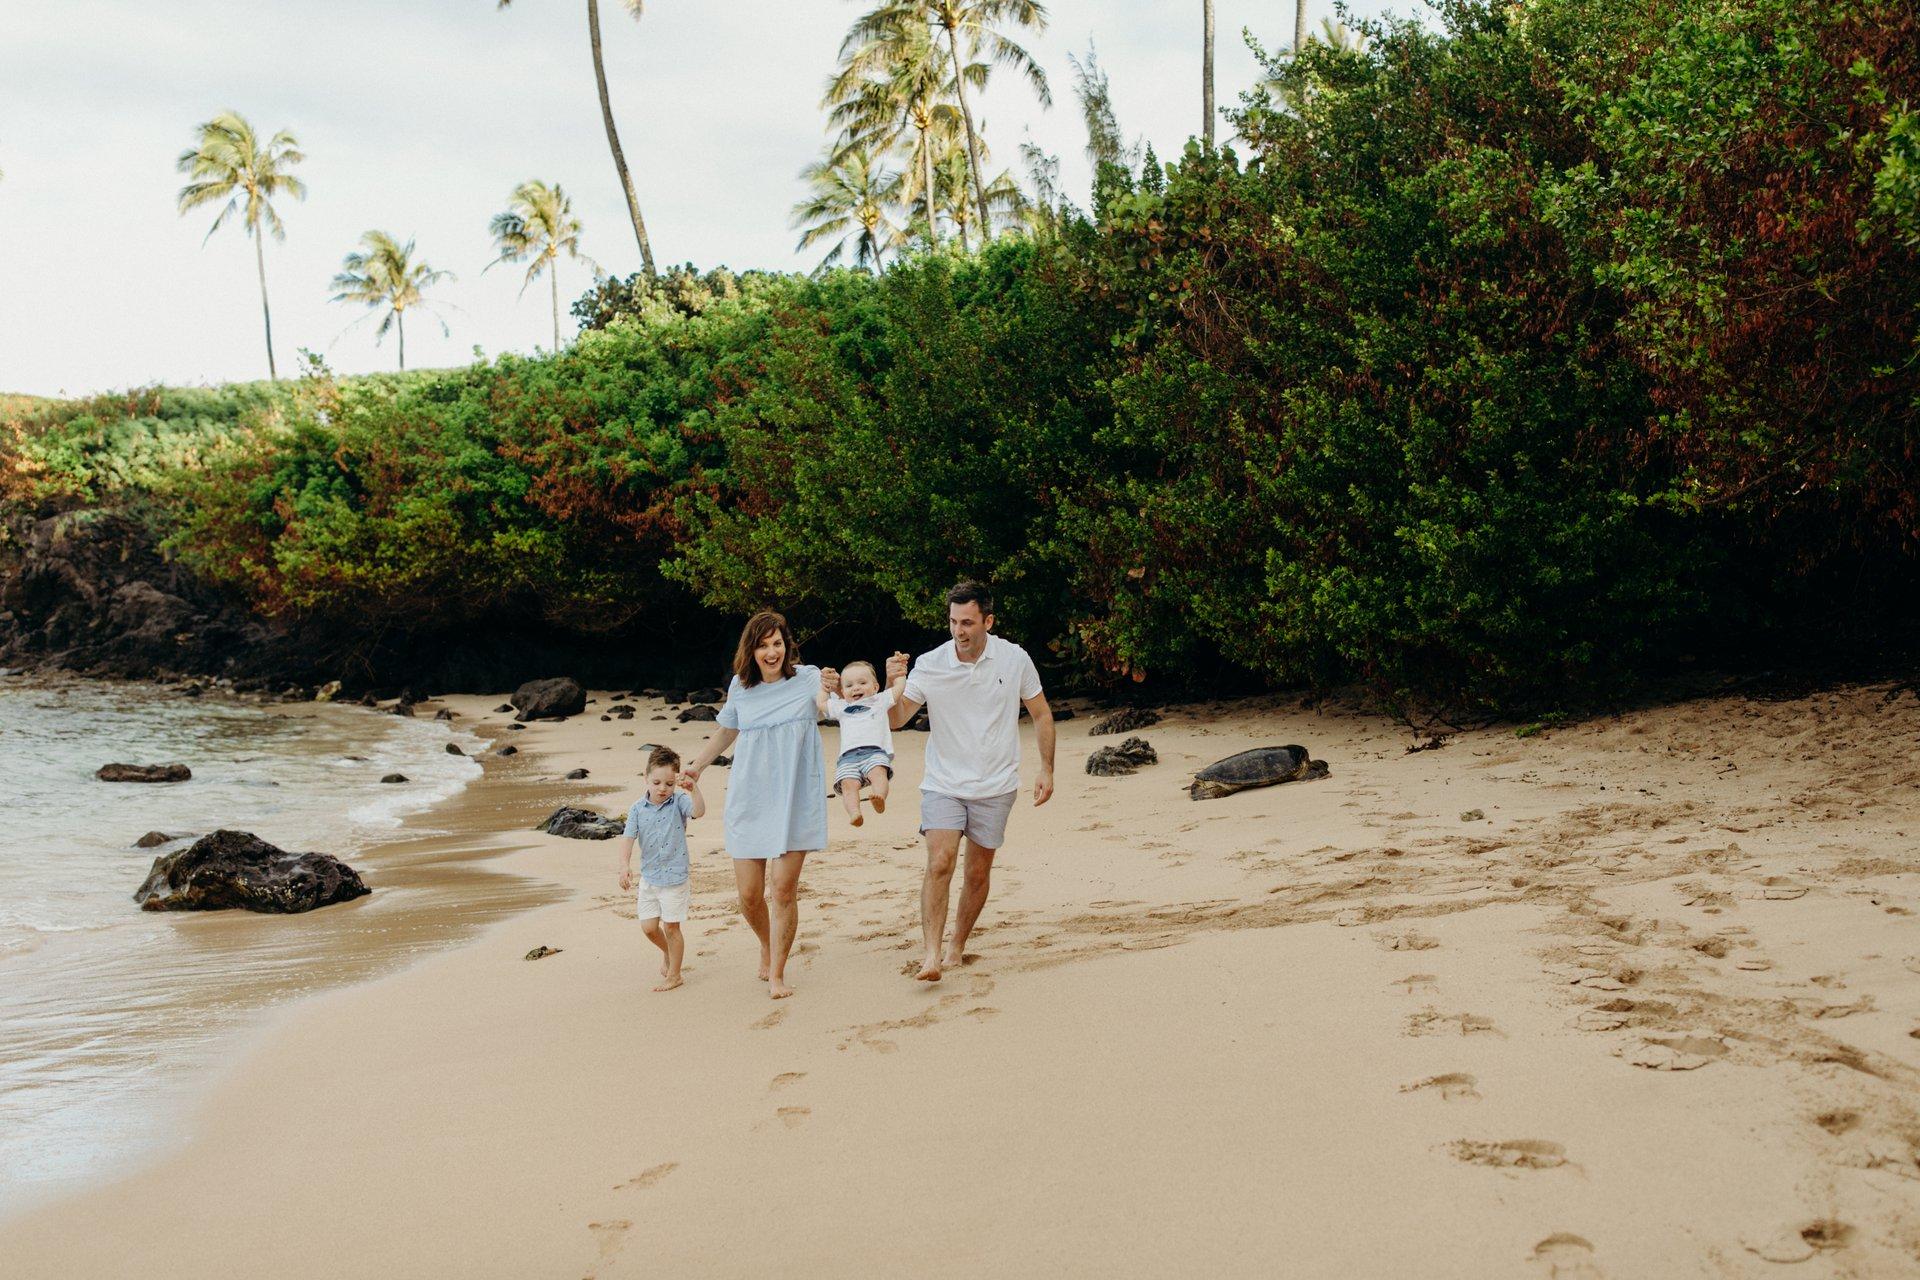 Maui-USA-travel-story-Flytographer-7